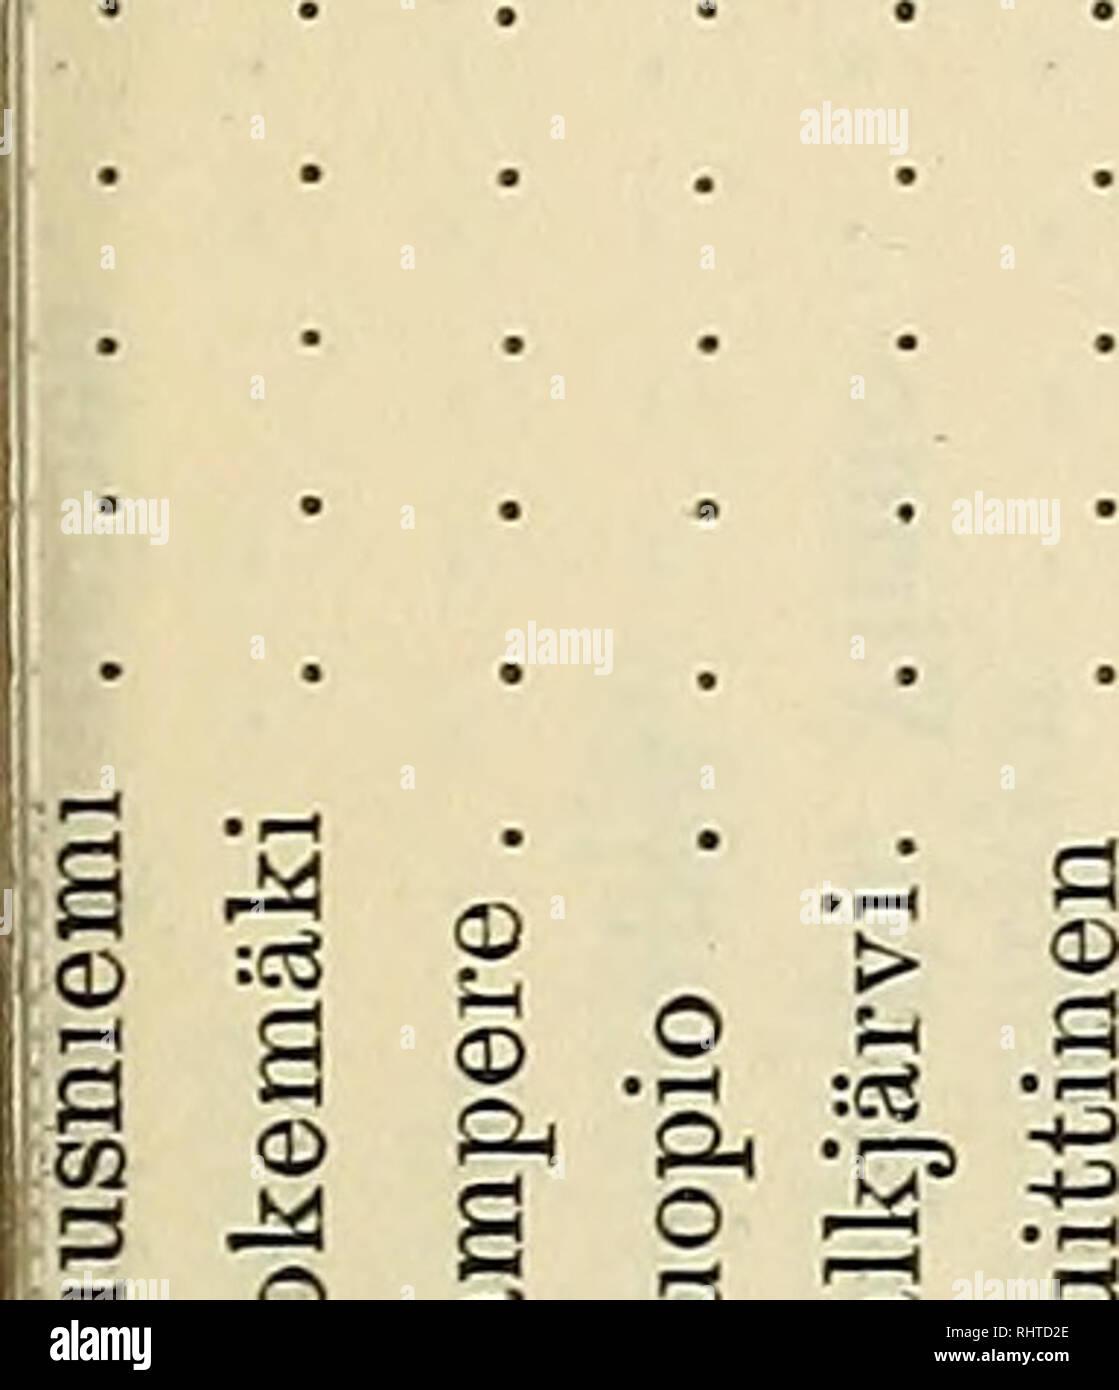 ". Jusqu'nnedom¤Bidrag kà av Finlands natur och folk. L'histoire naturelle. 151 J'^:0 5 Q id""! (D O M &gt;^ di cS Oh OJJ <D o) G côte' es 35 Ph m w^^^1 1 g t^^ h t s ,j""j'^ ^ ^» 02 GQ un? Ce ^"" CQ ce -* CO H ^ ^ â Å w ^ ^ ^ ^ P gl Å"" CQ C/2 Â""2 2j'^^ &AMP; Å Å 02 CQ CQ ce S"" ^^ ^ fe"" '"" ^ P un pu- p- p&Lt; P. PI PL CS CS CS CS CS o o îo CO ¢§* o 1 1 1 O O 1 1 CO CO 1 S 1 O 1 CM ^ lO O s 130 lO lO lO <r) ^^ CO CD - lO P. Pi p, p, p( PI PI PI PL PL CS CS CS CS CS CB O o ^ 1 ICC 11 CO o 11 s. 2 O 1 O O t CO CO^ »* CD â â ""* * * '^^ c- CO c "" rj Photo Stock"